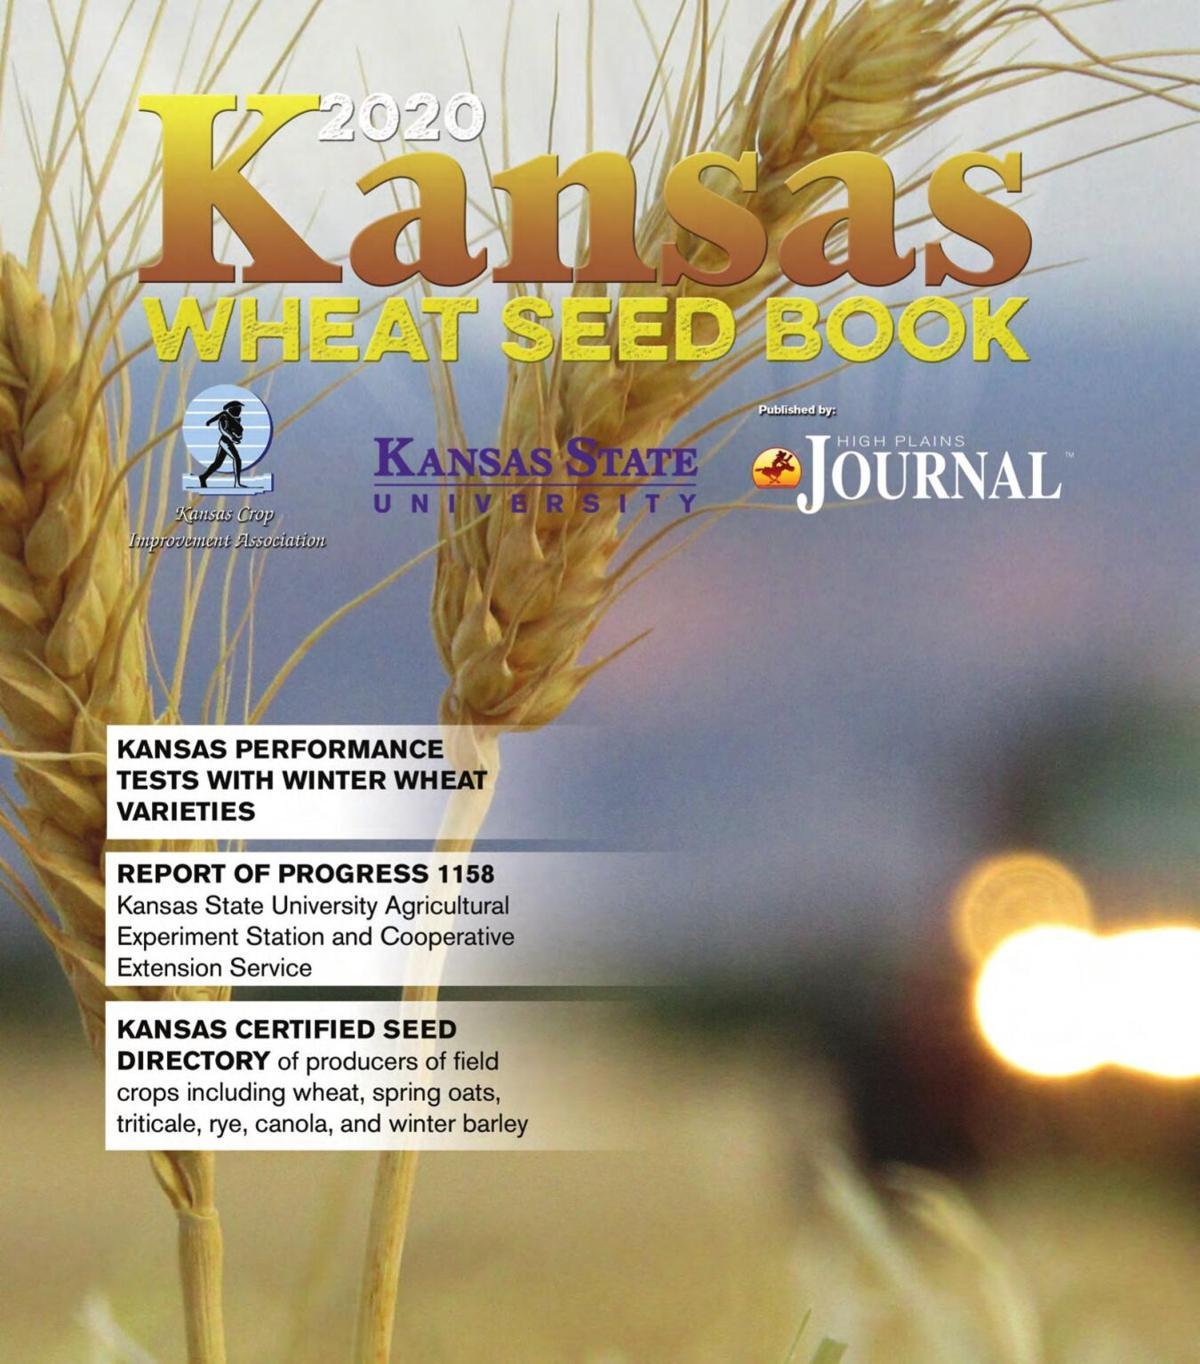 2020 Kansas Wheat Seed Book